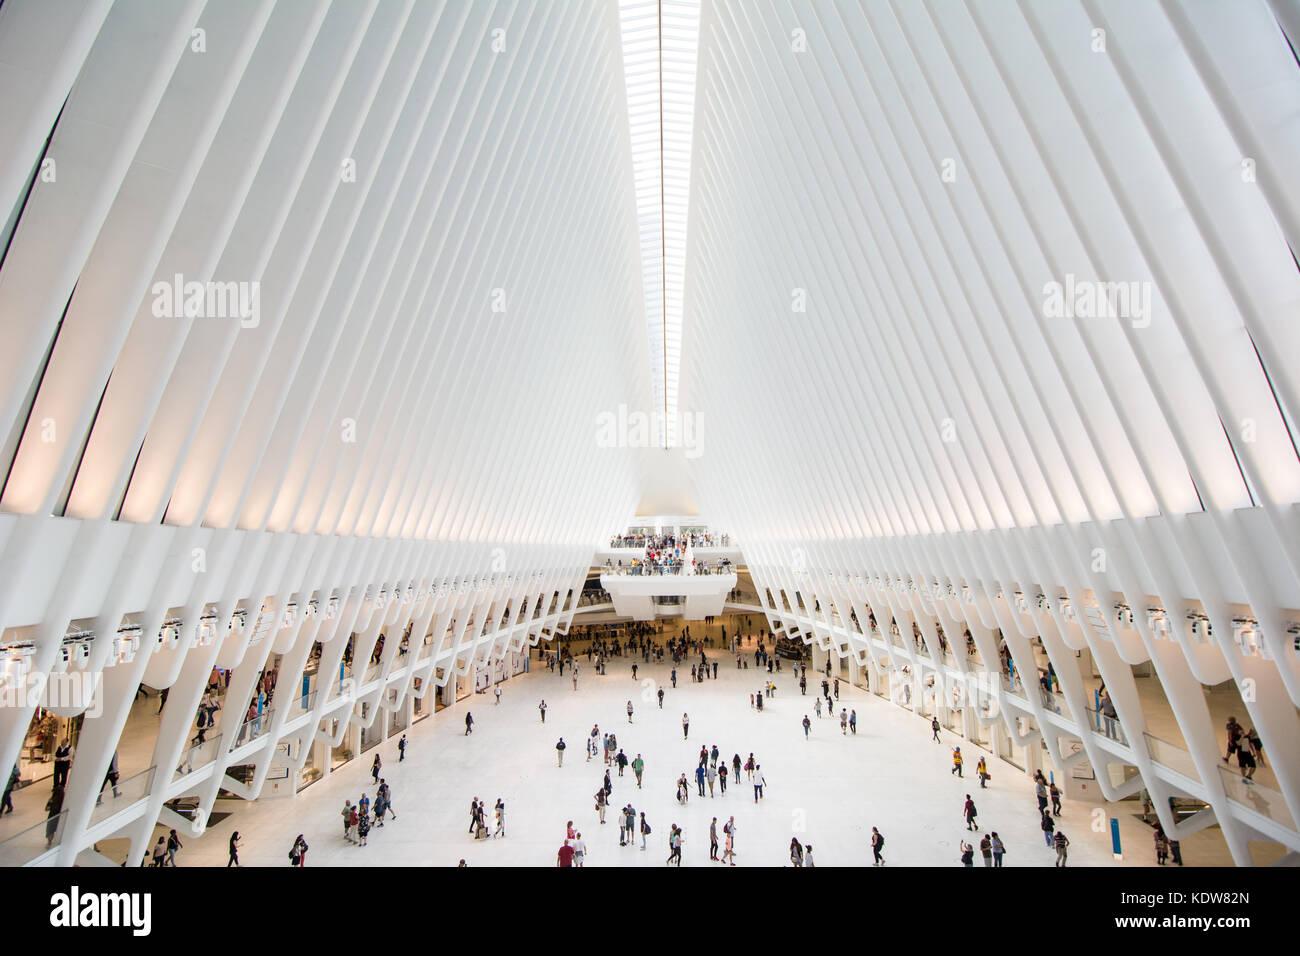 L'impressionnante architecture de l'Oculus au World Trade Center transportation hub à New York, United States Banque D'Images